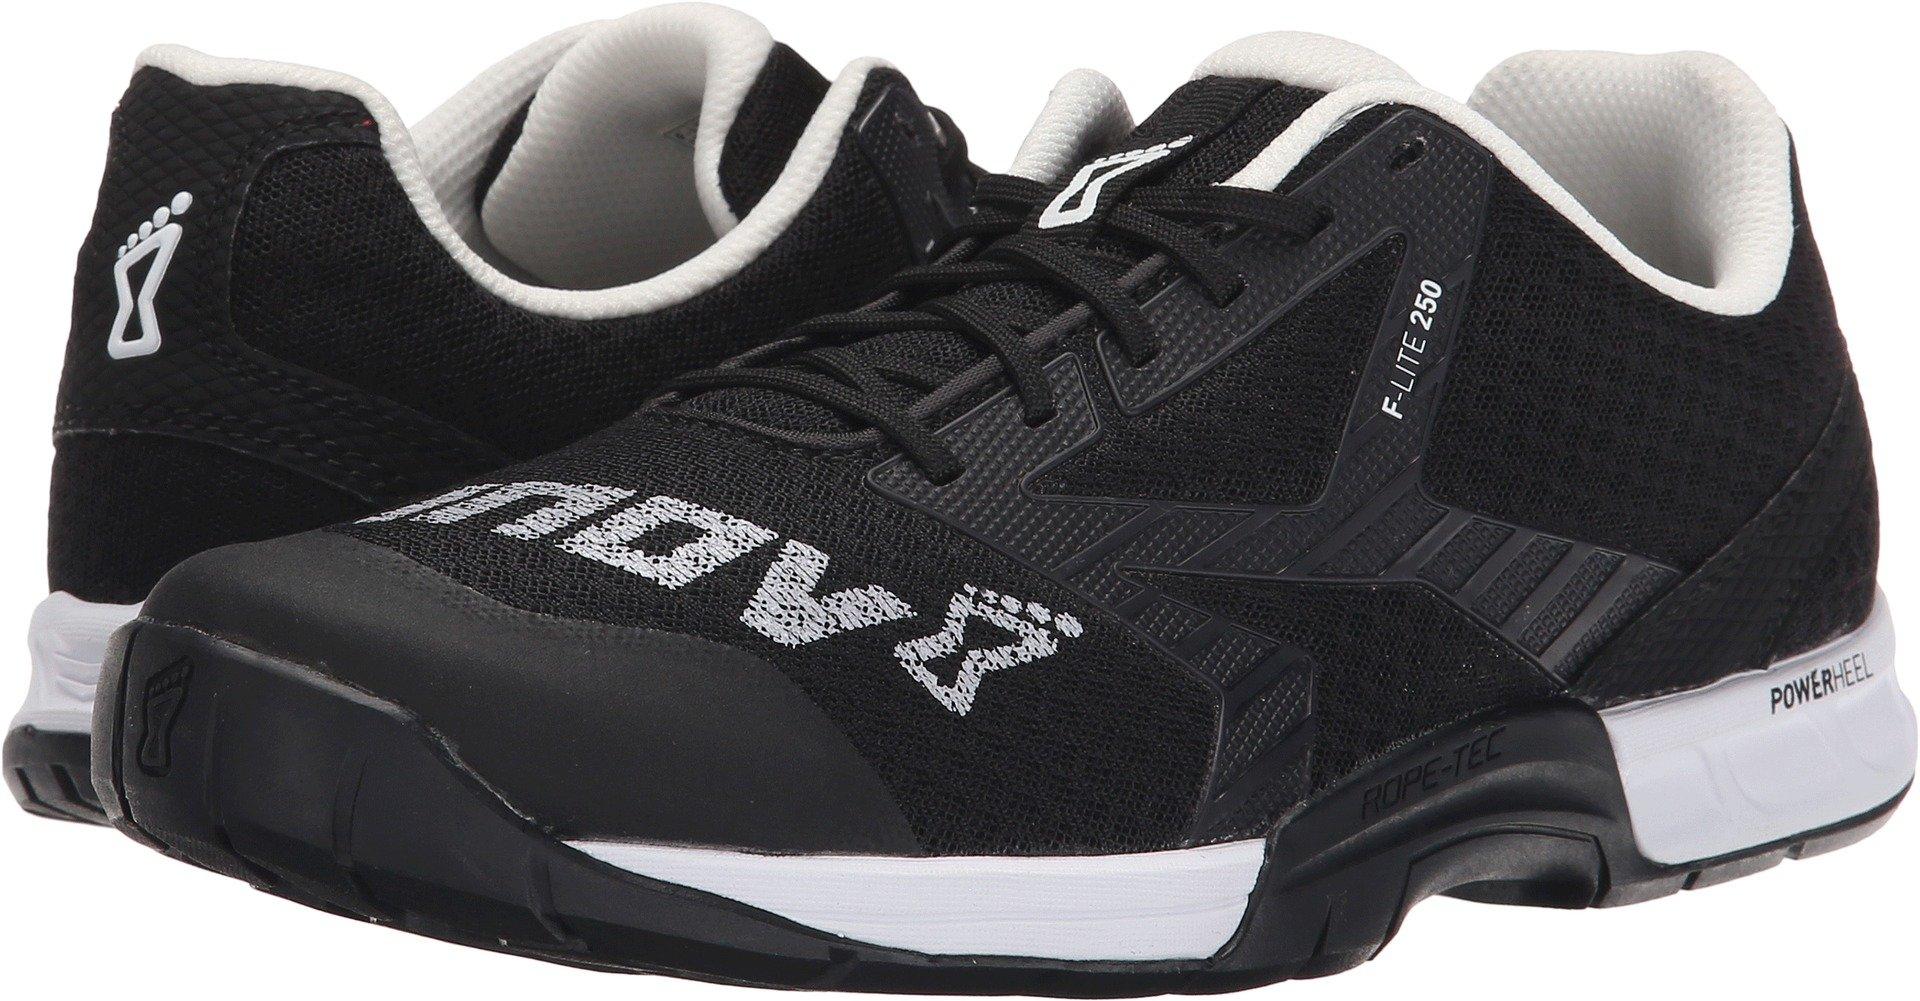 Inov-8 Women's F-Lite 250 Fitness Shoe, Black/White, 8.5 B US